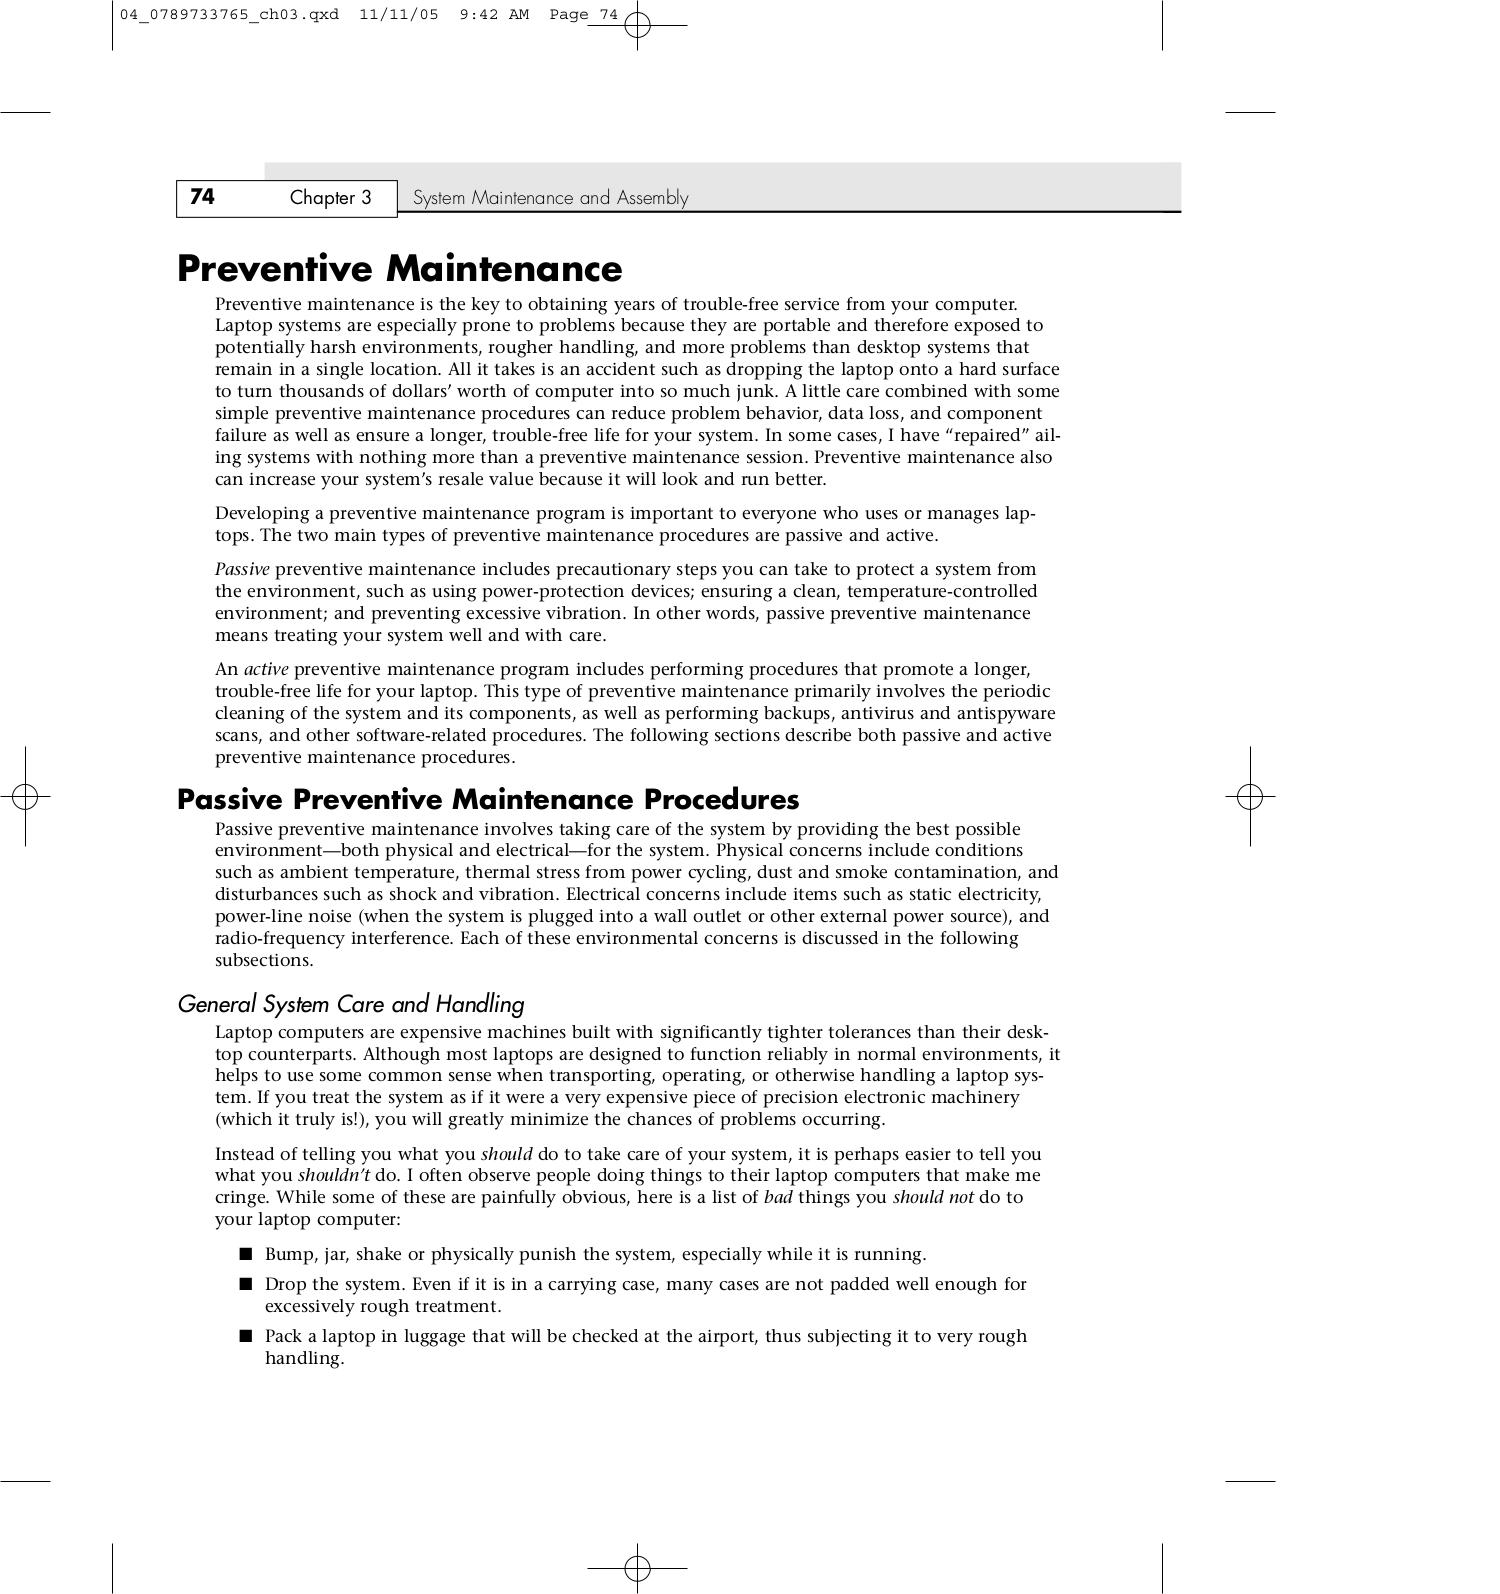 Preventive Maintenance Procedure Pdf